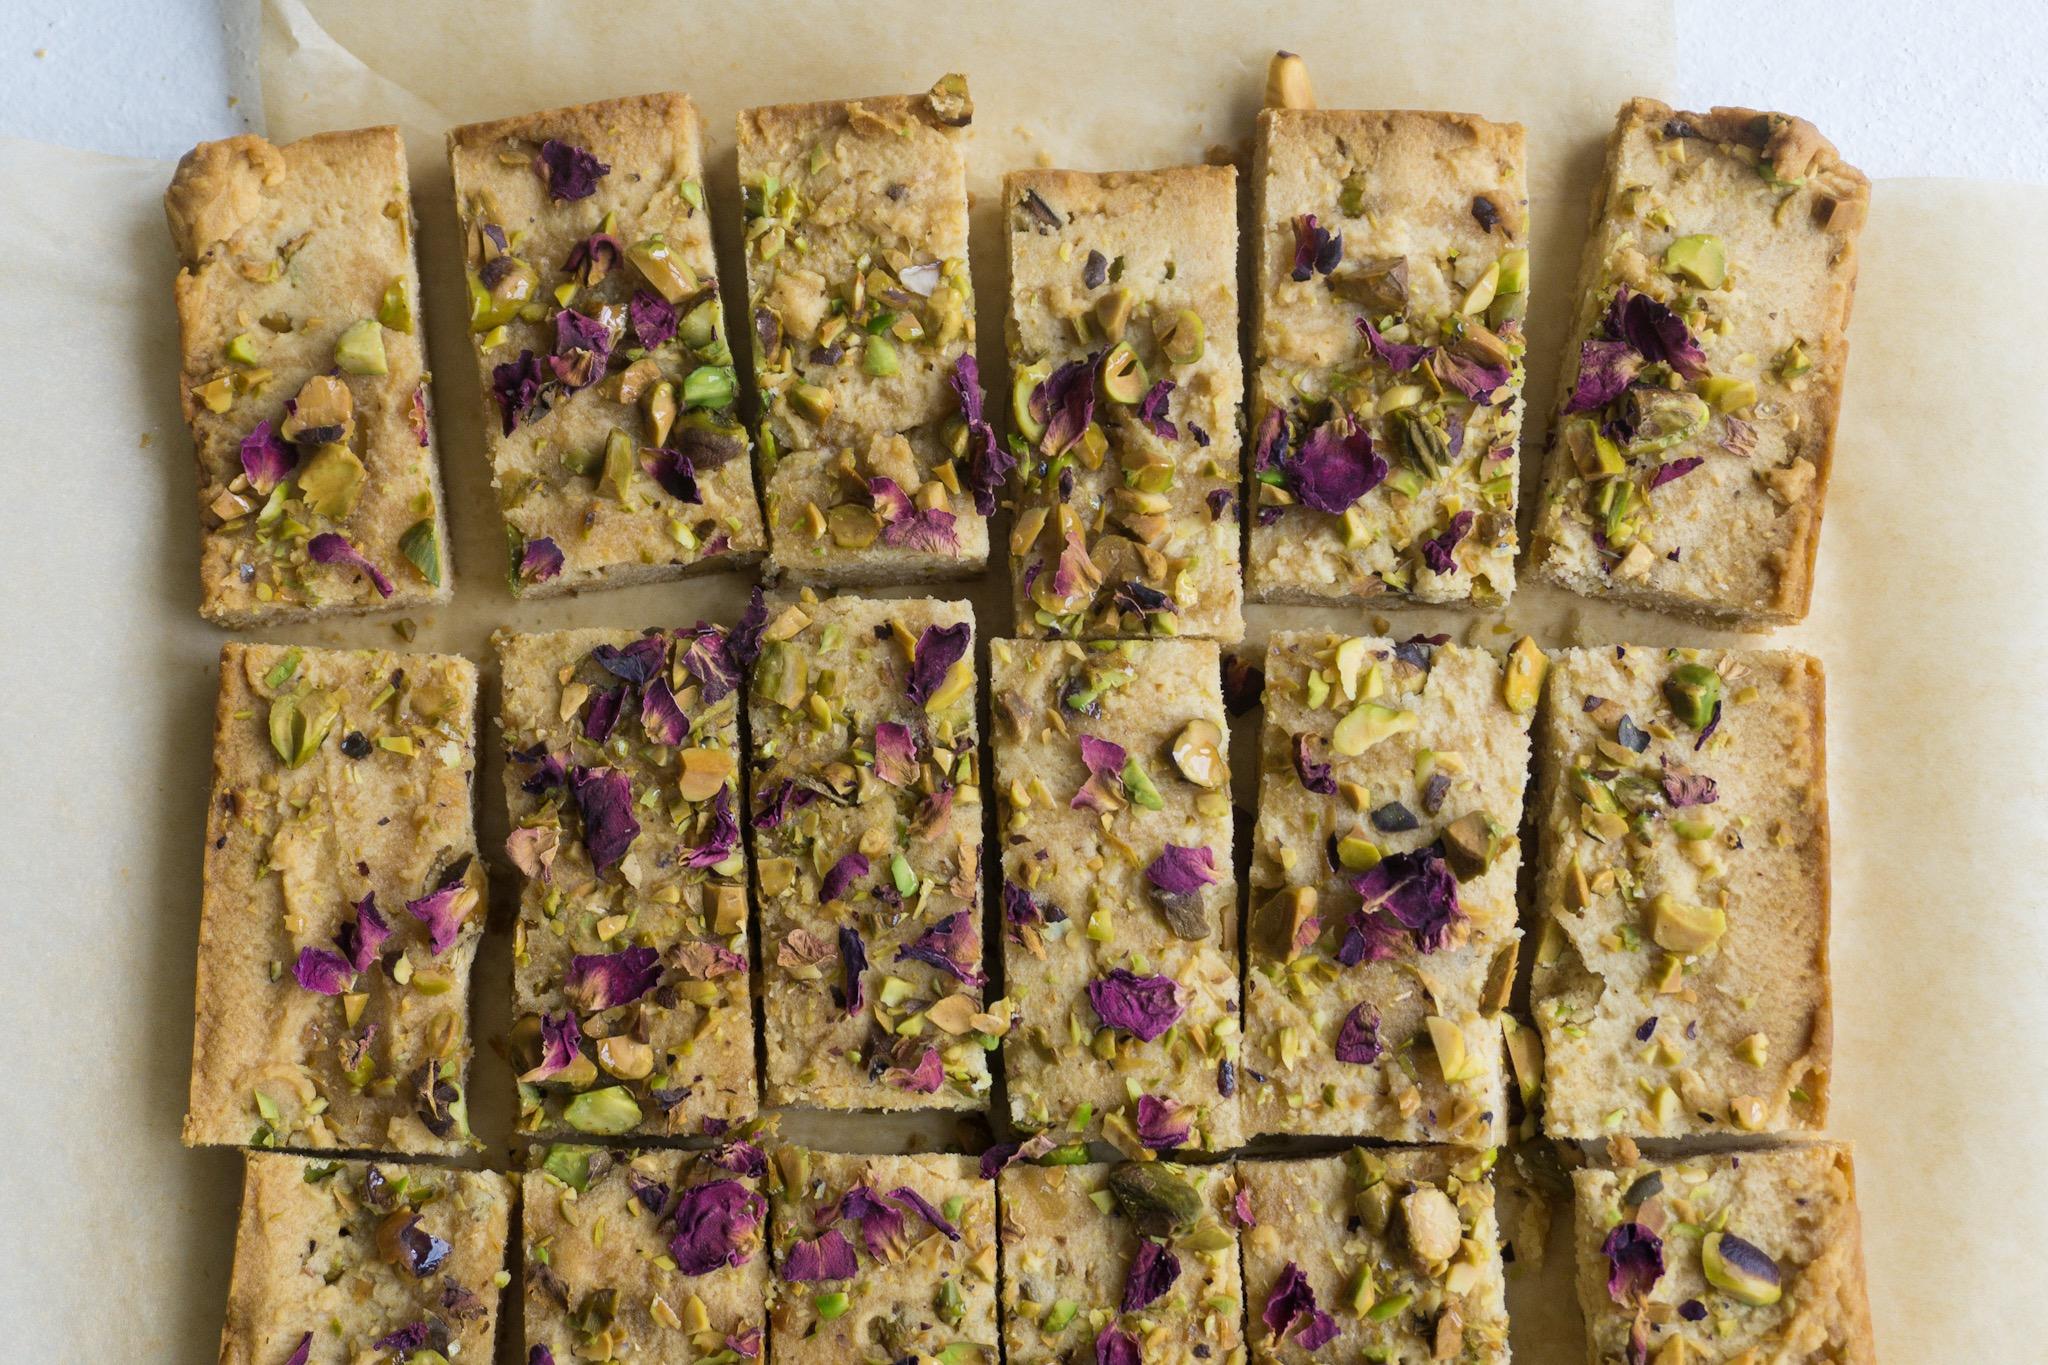 Honey, Rose and Pistachio Shortbread Cookies